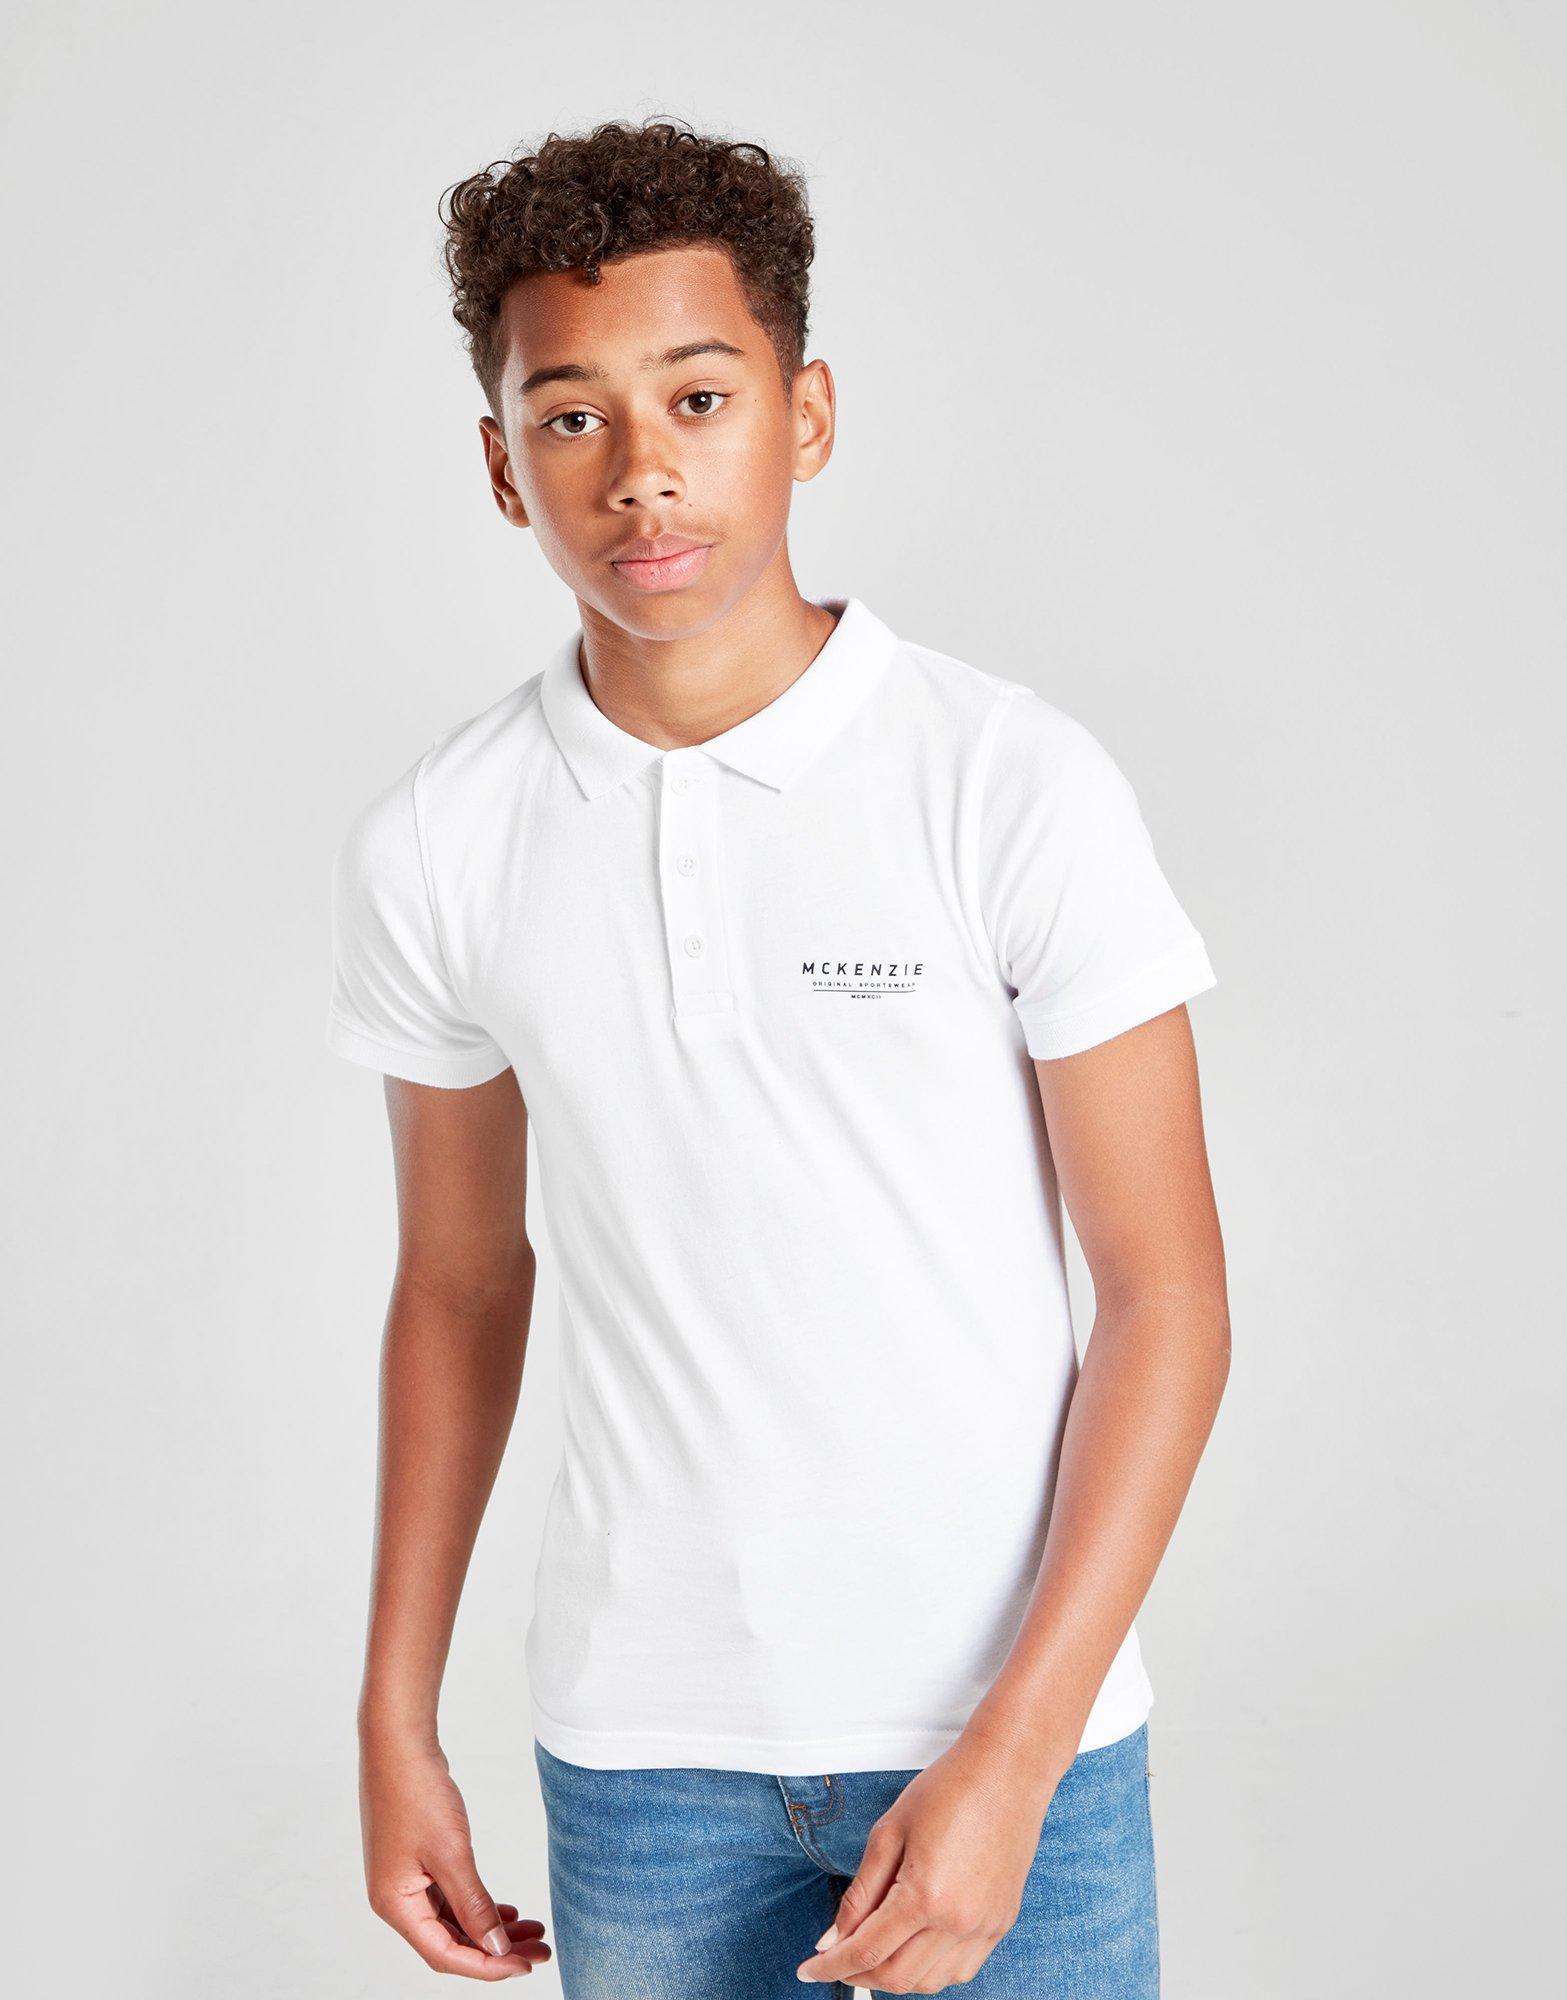 New Mckenzie Men's Essential Polo Short Sleeve Shirt